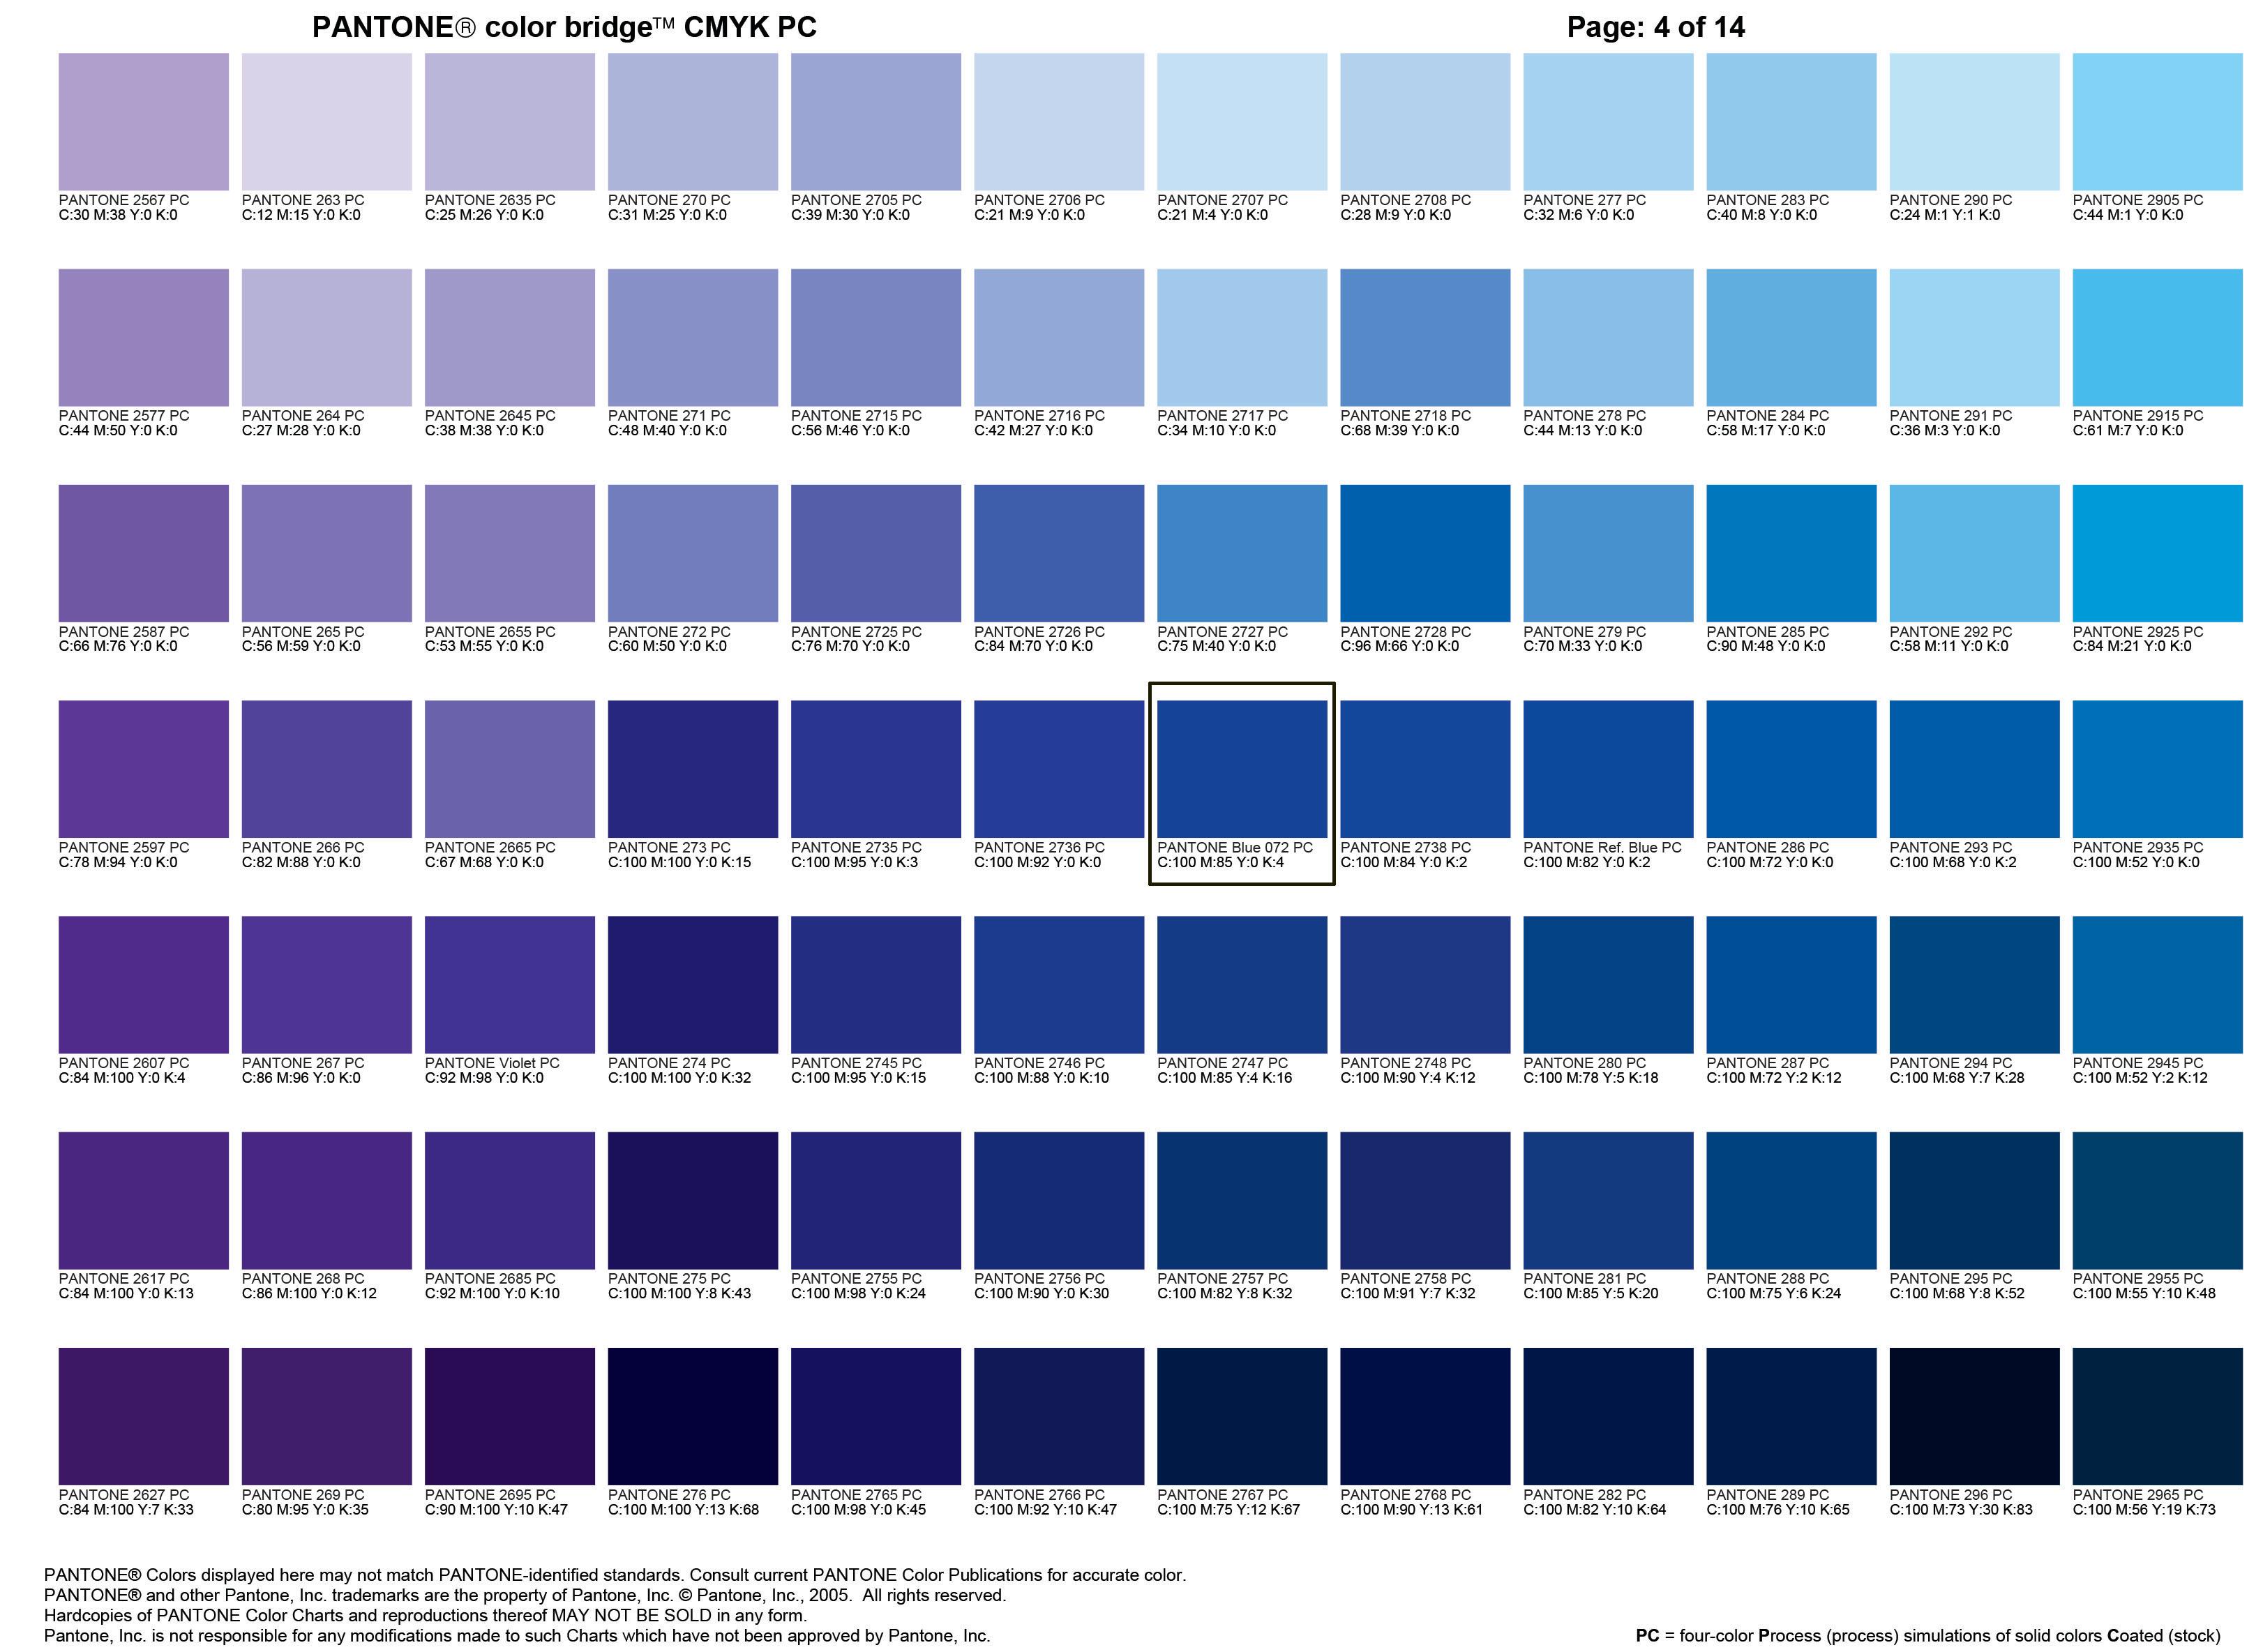 chromatologio-4-Blue072